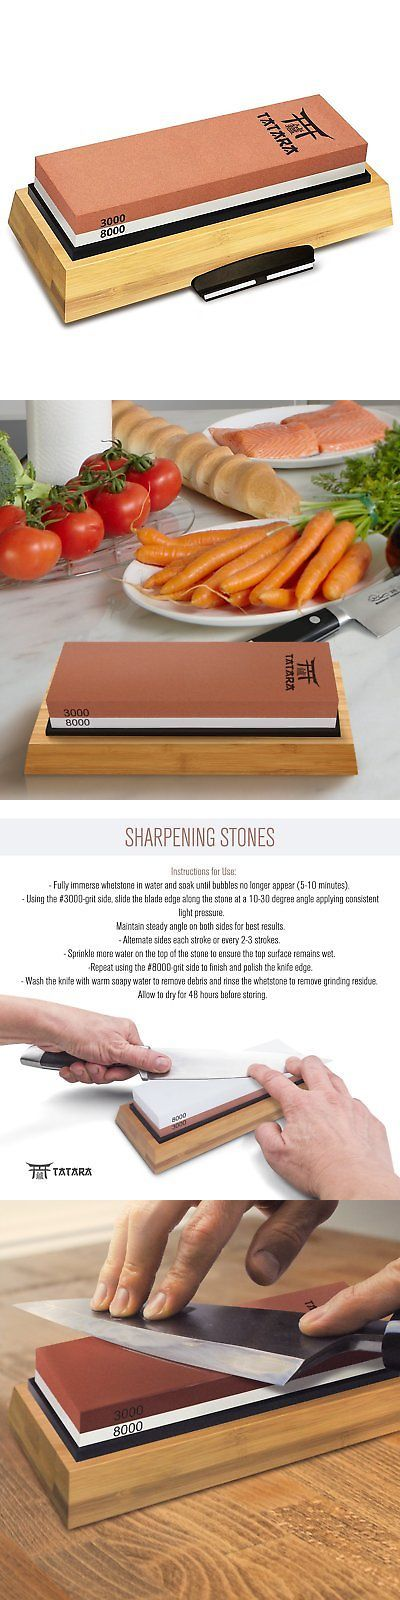 Sharpeners 116005: Tatara Sharpening Stone 3000 And 8000 Grit - Double Sided Japanese Whetstone Set -> BUY IT NOW ONLY: $43.01 on eBay!